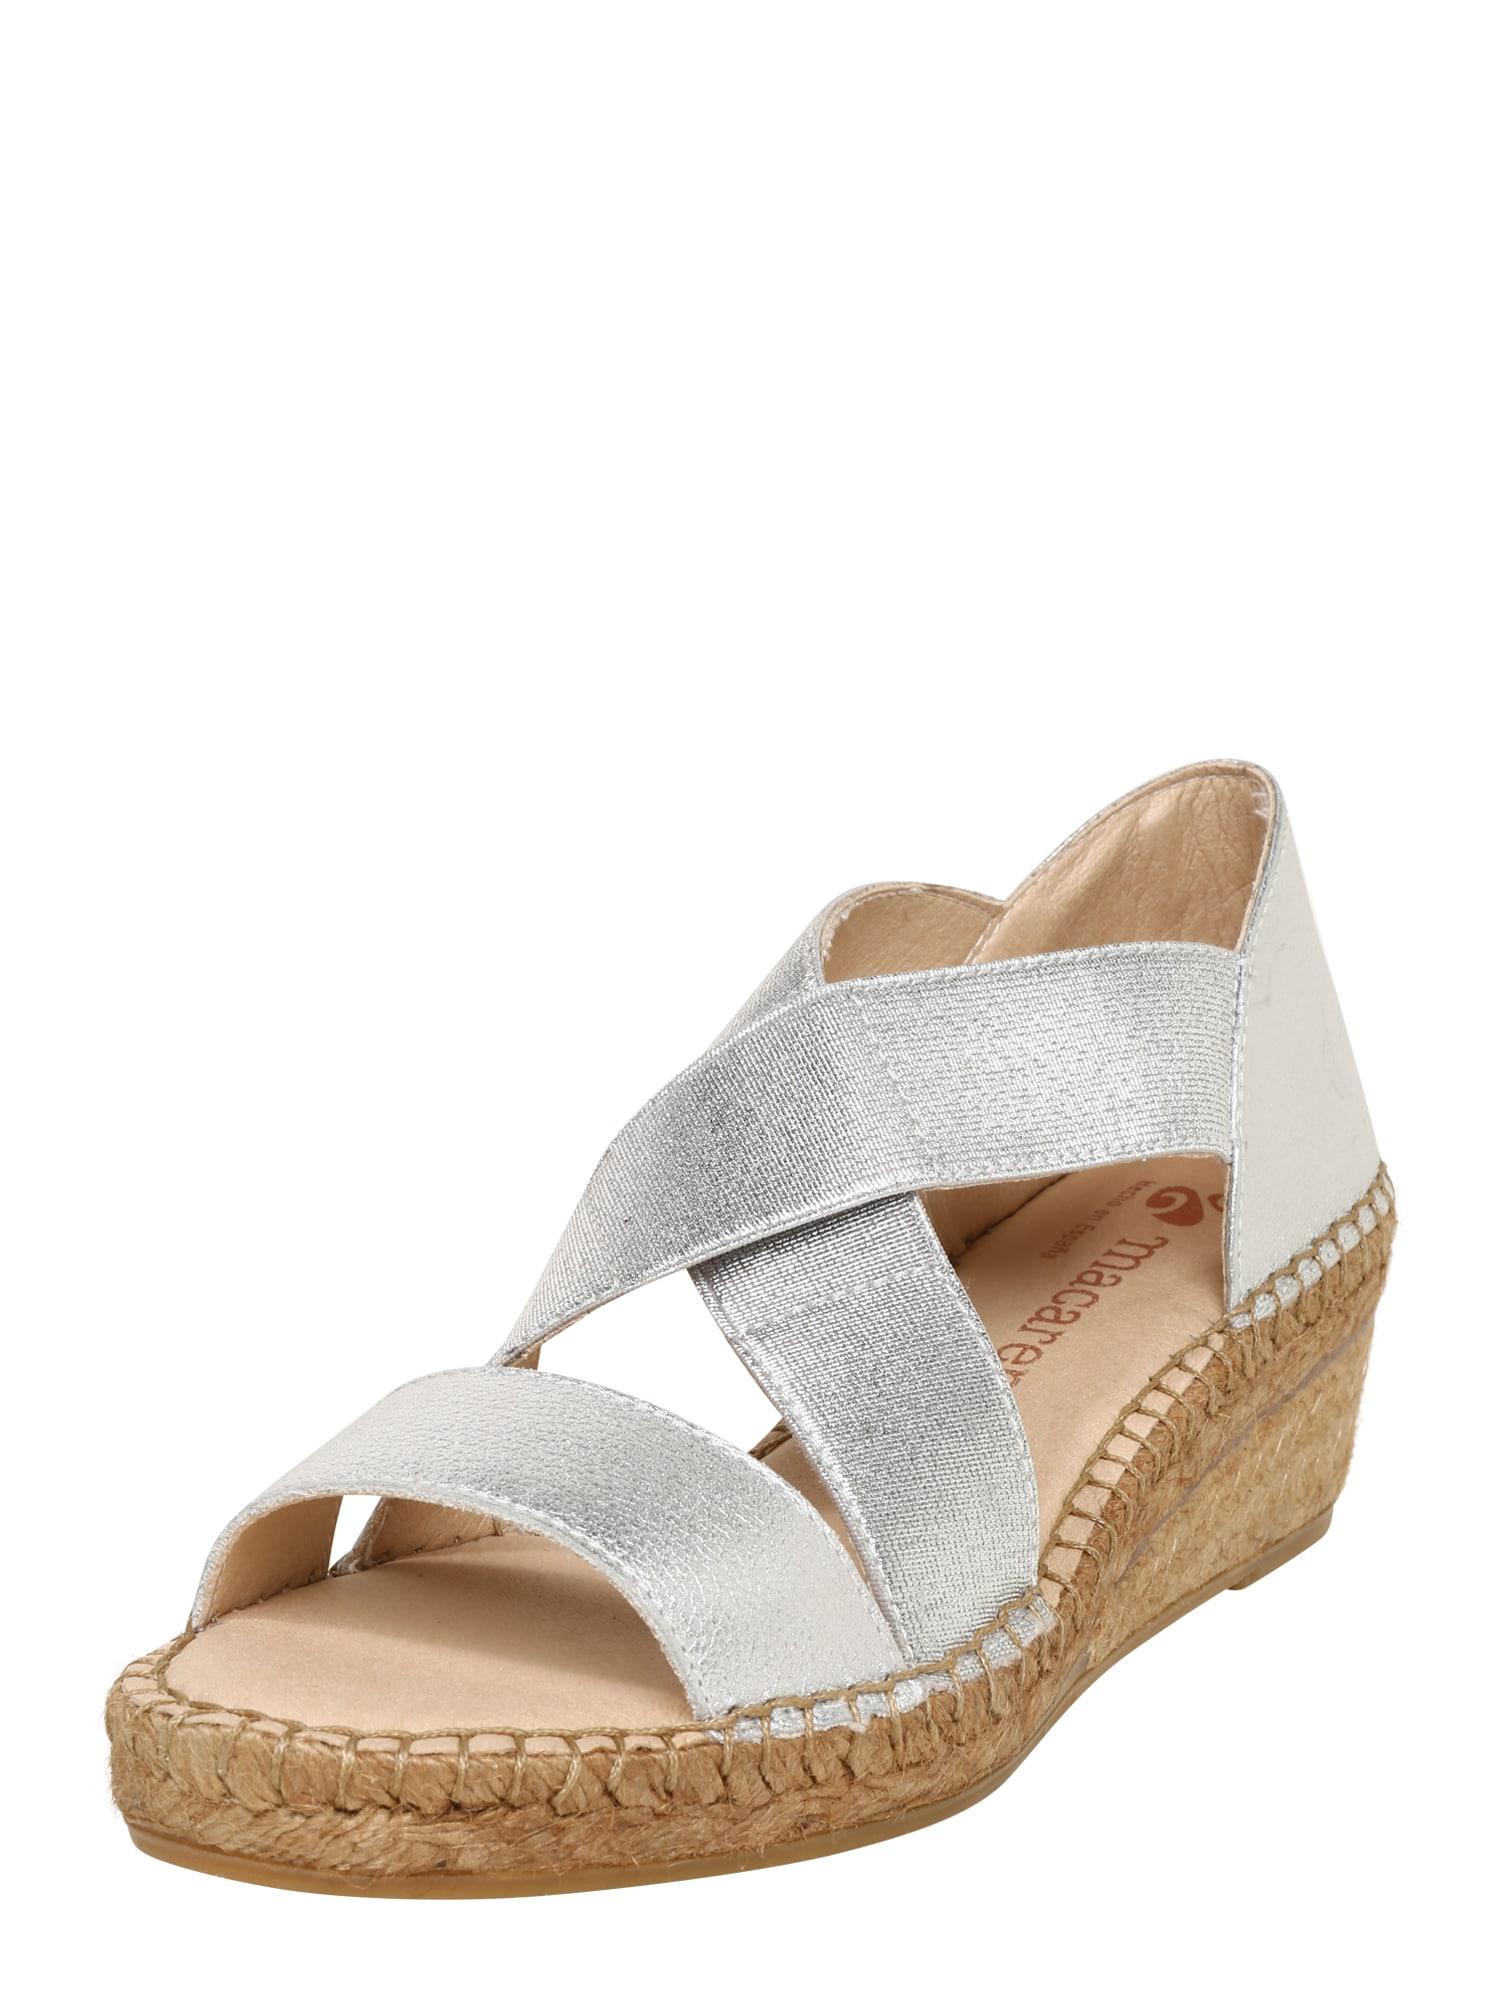 Sandály LUNA 84 béžová stříbrná MACARENA